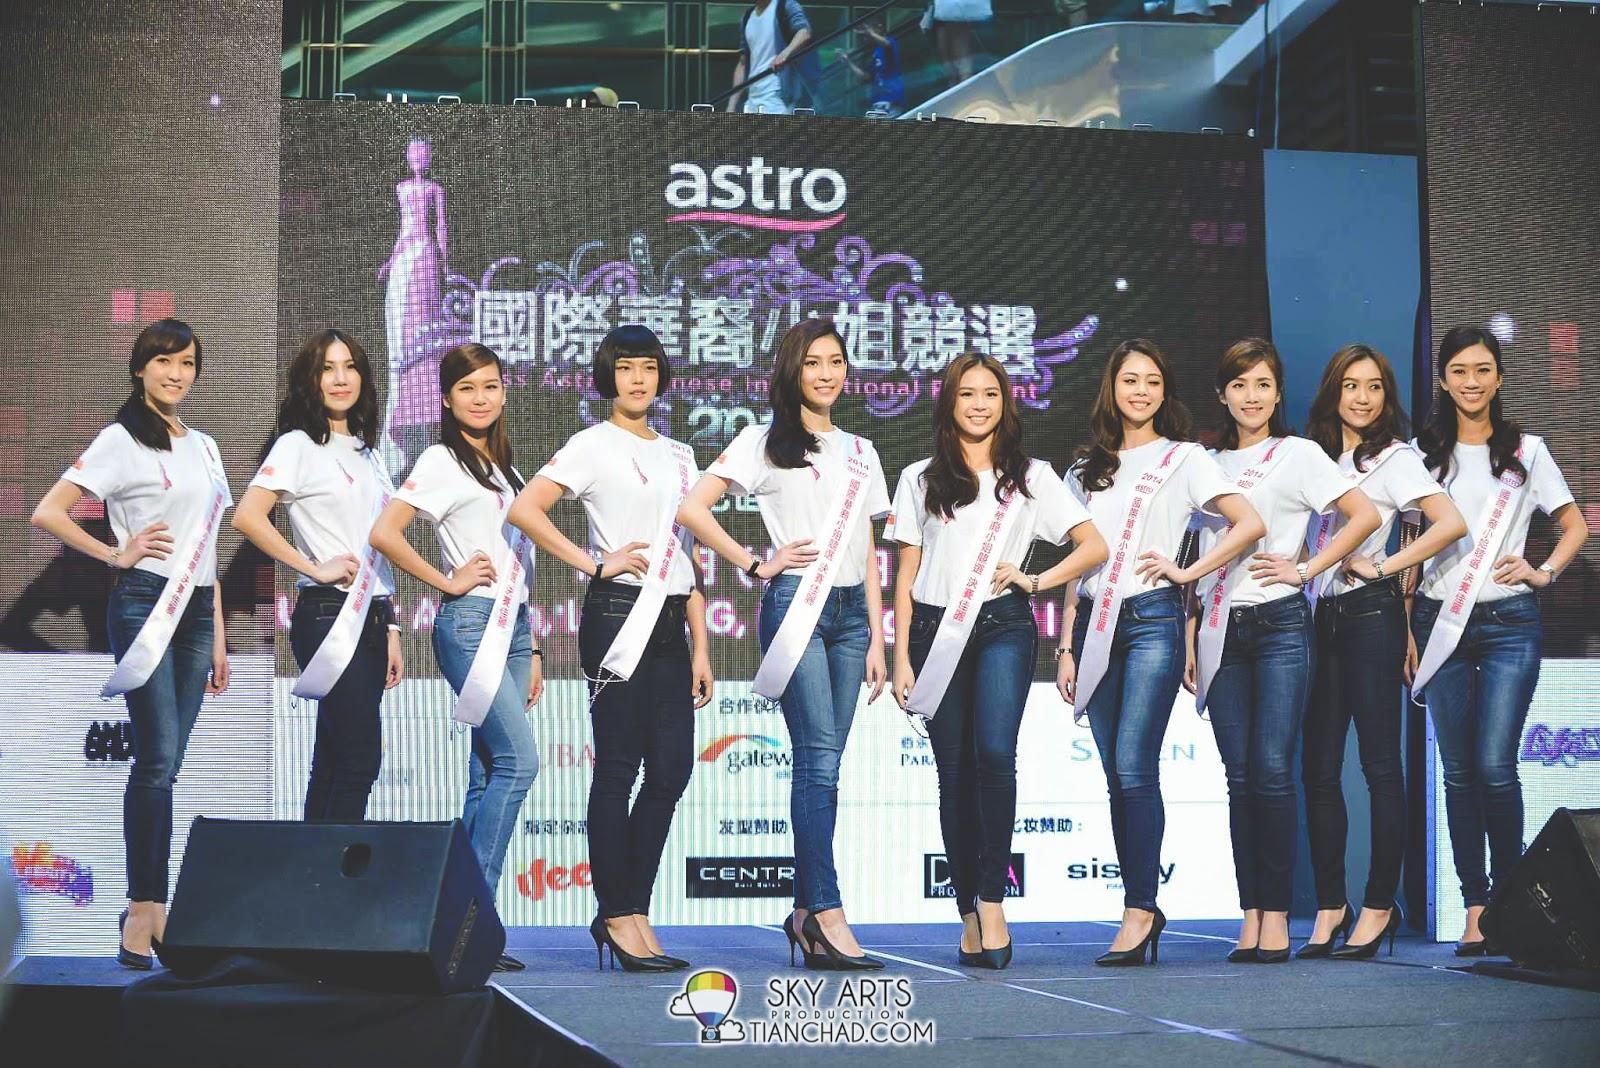 《Astro国际华裔小姐竞选2014》十强佳丽首度公开亮相会见媒体及观众